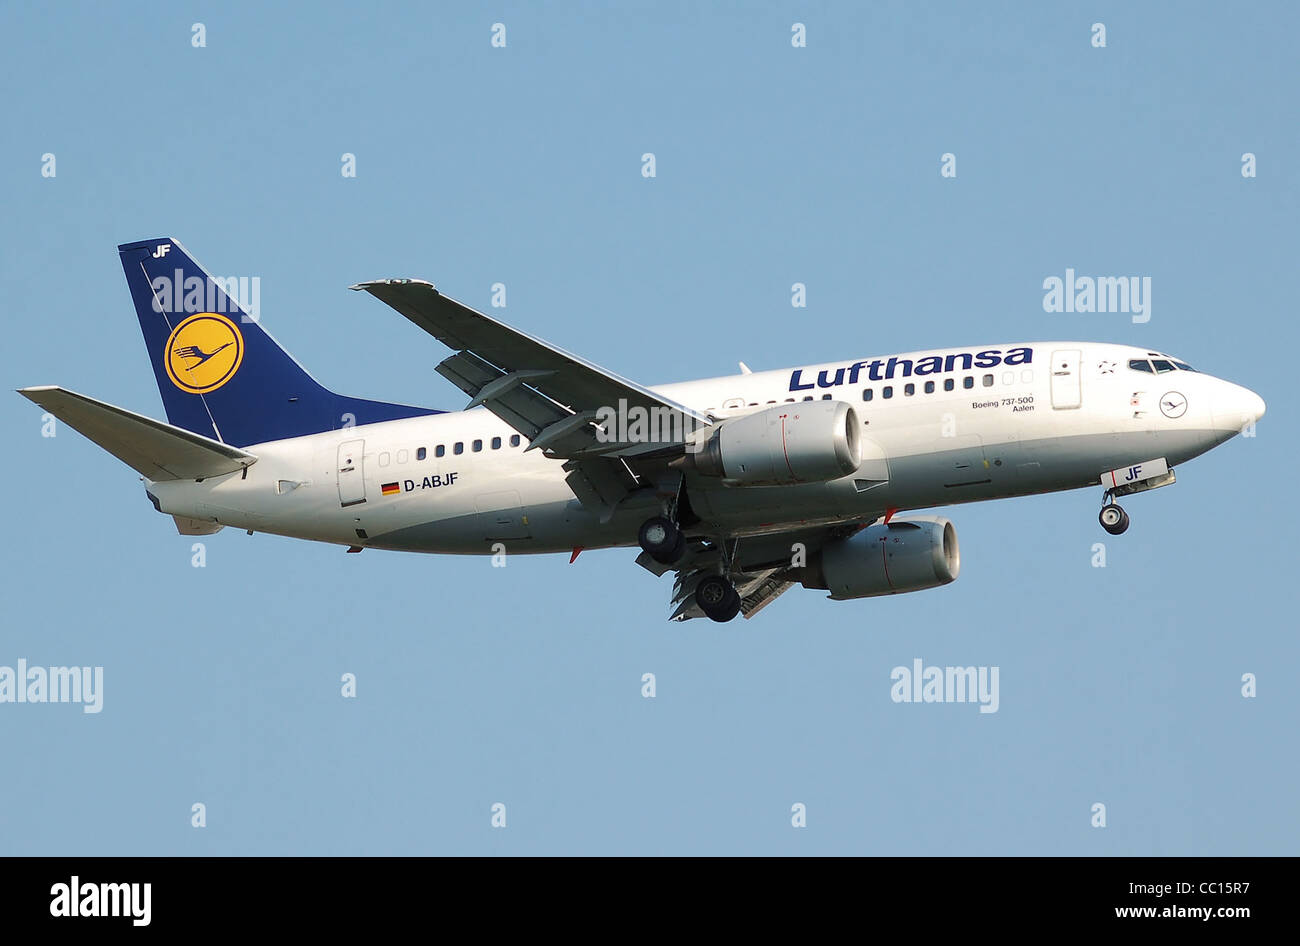 Lufthansa Boeing 737 500 D Abjf Aalen Lands At London Heathrow Stock Photo Alamy